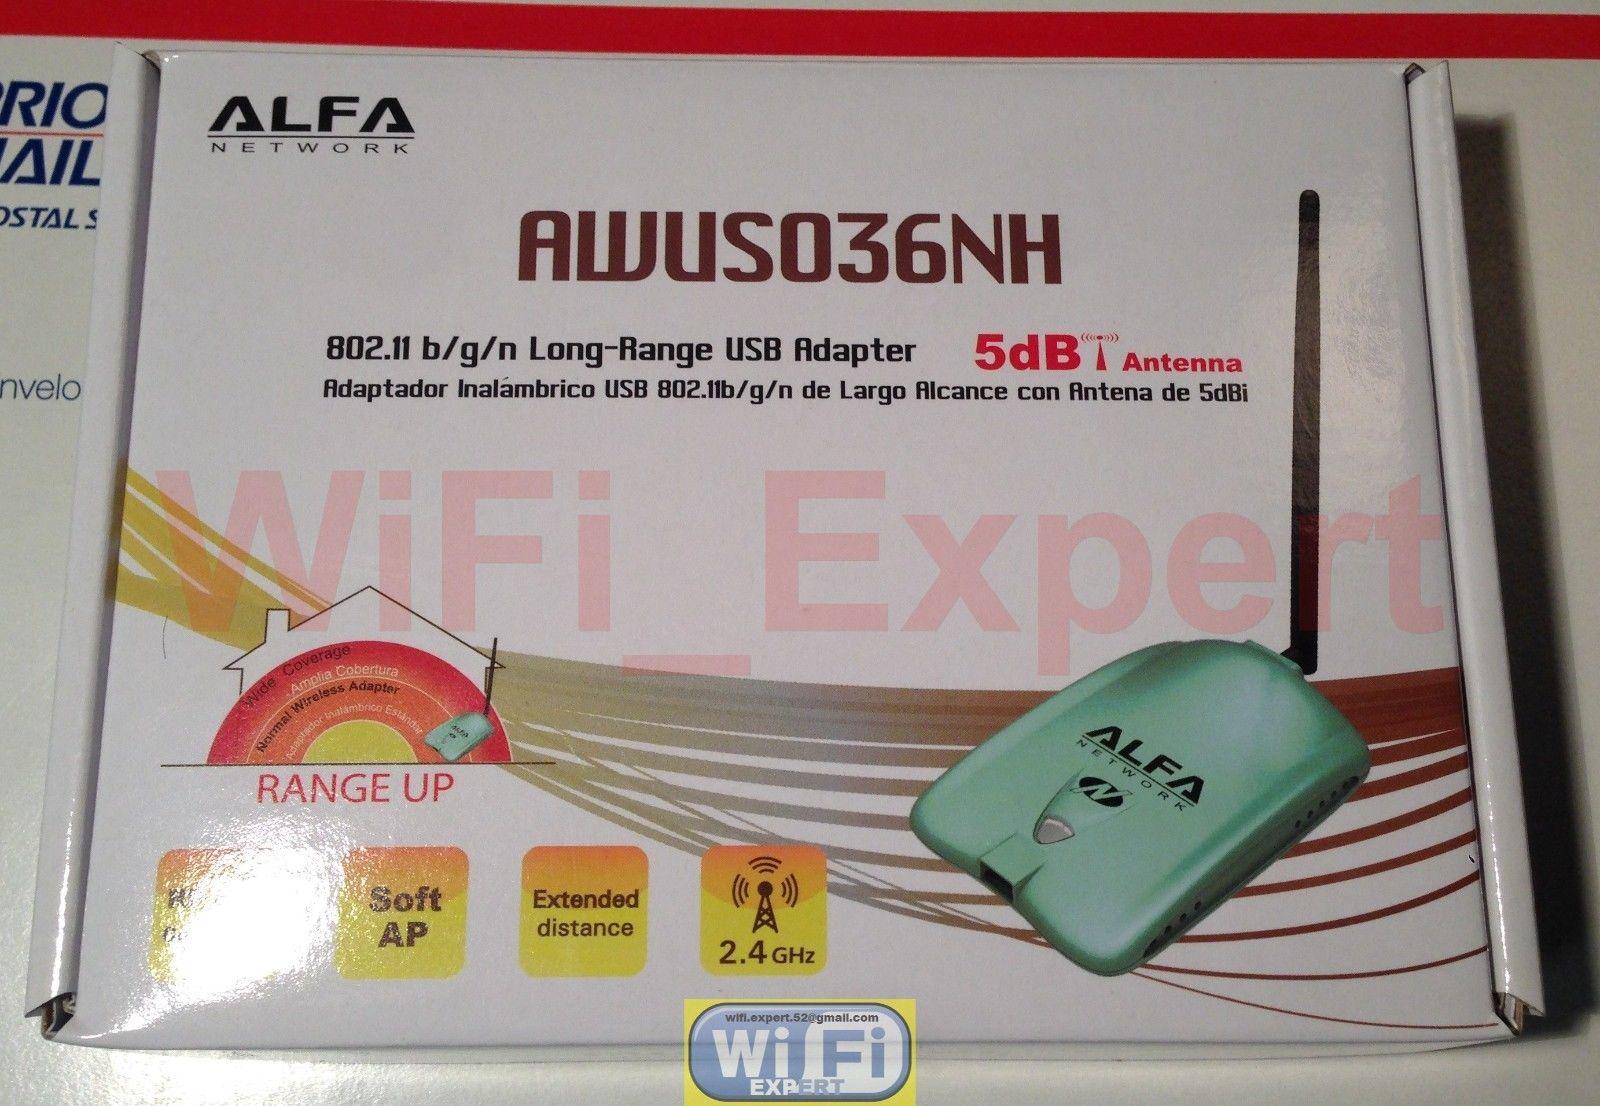 WiFi Antenna 15dBi BiQuad ALFA R36 +G/N Net Long Range Booster GET FREE  INTERNET